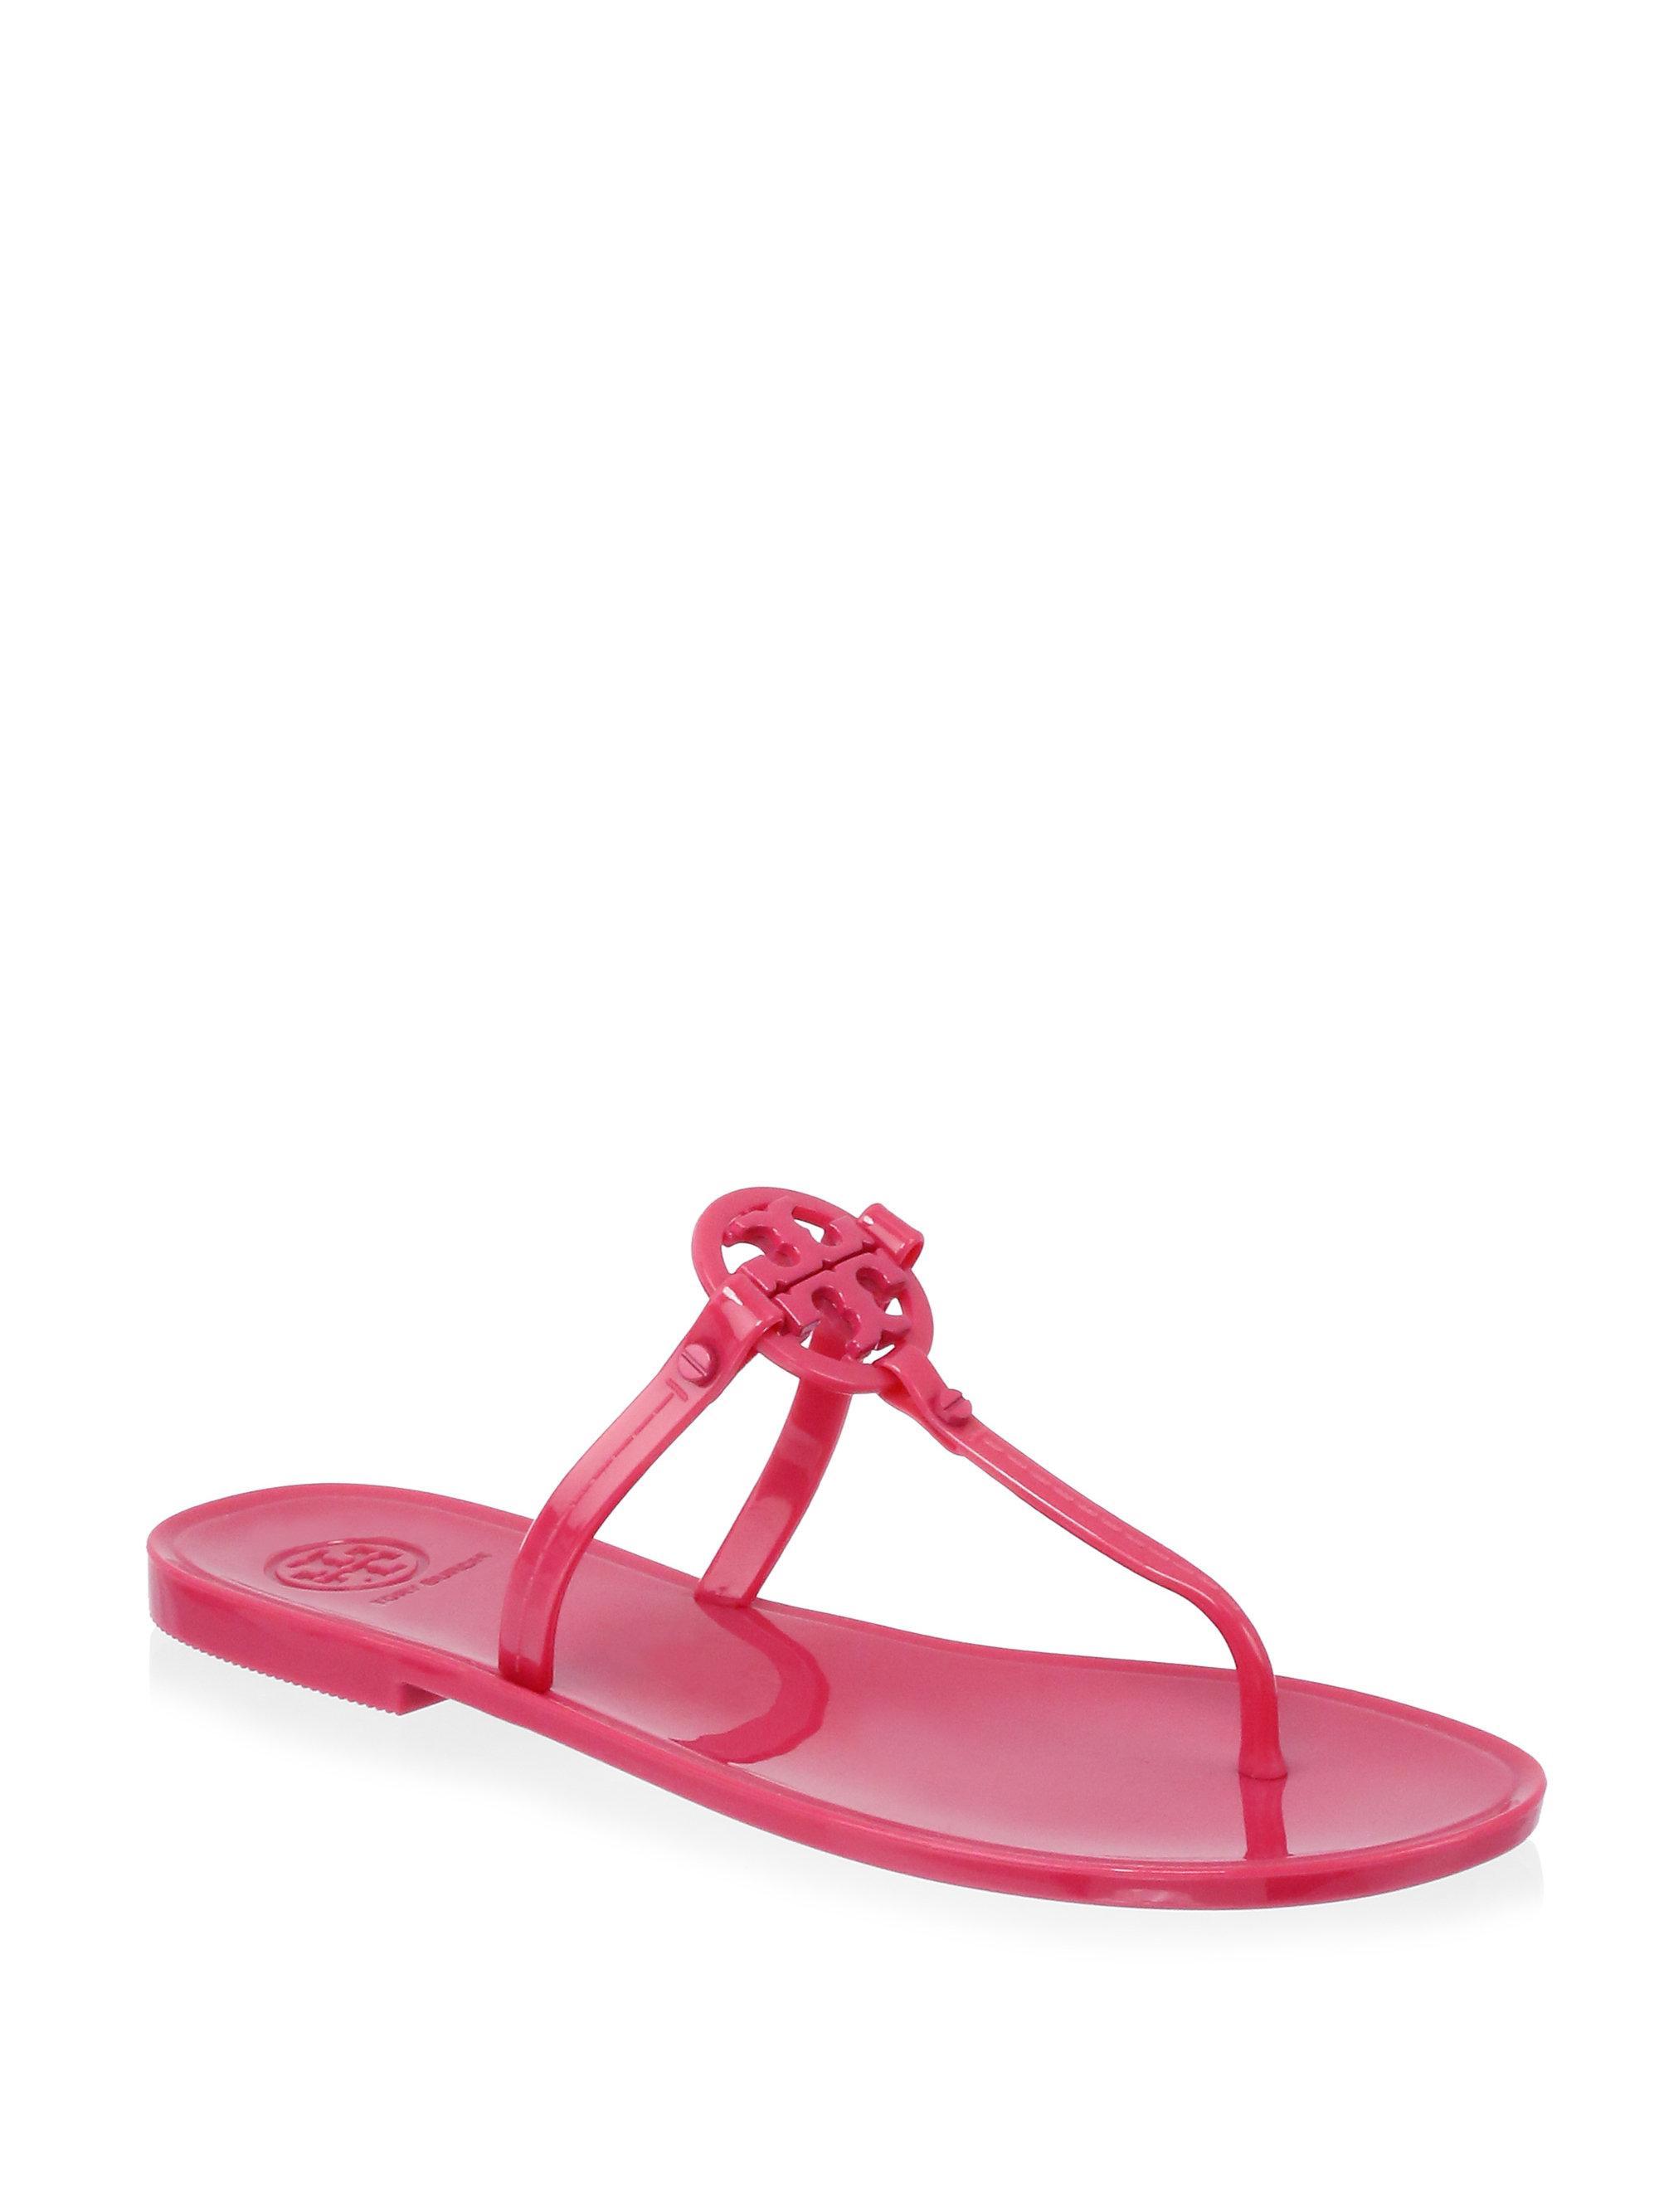 Tory Burch Glossy Thong Sandals oF5uZisE